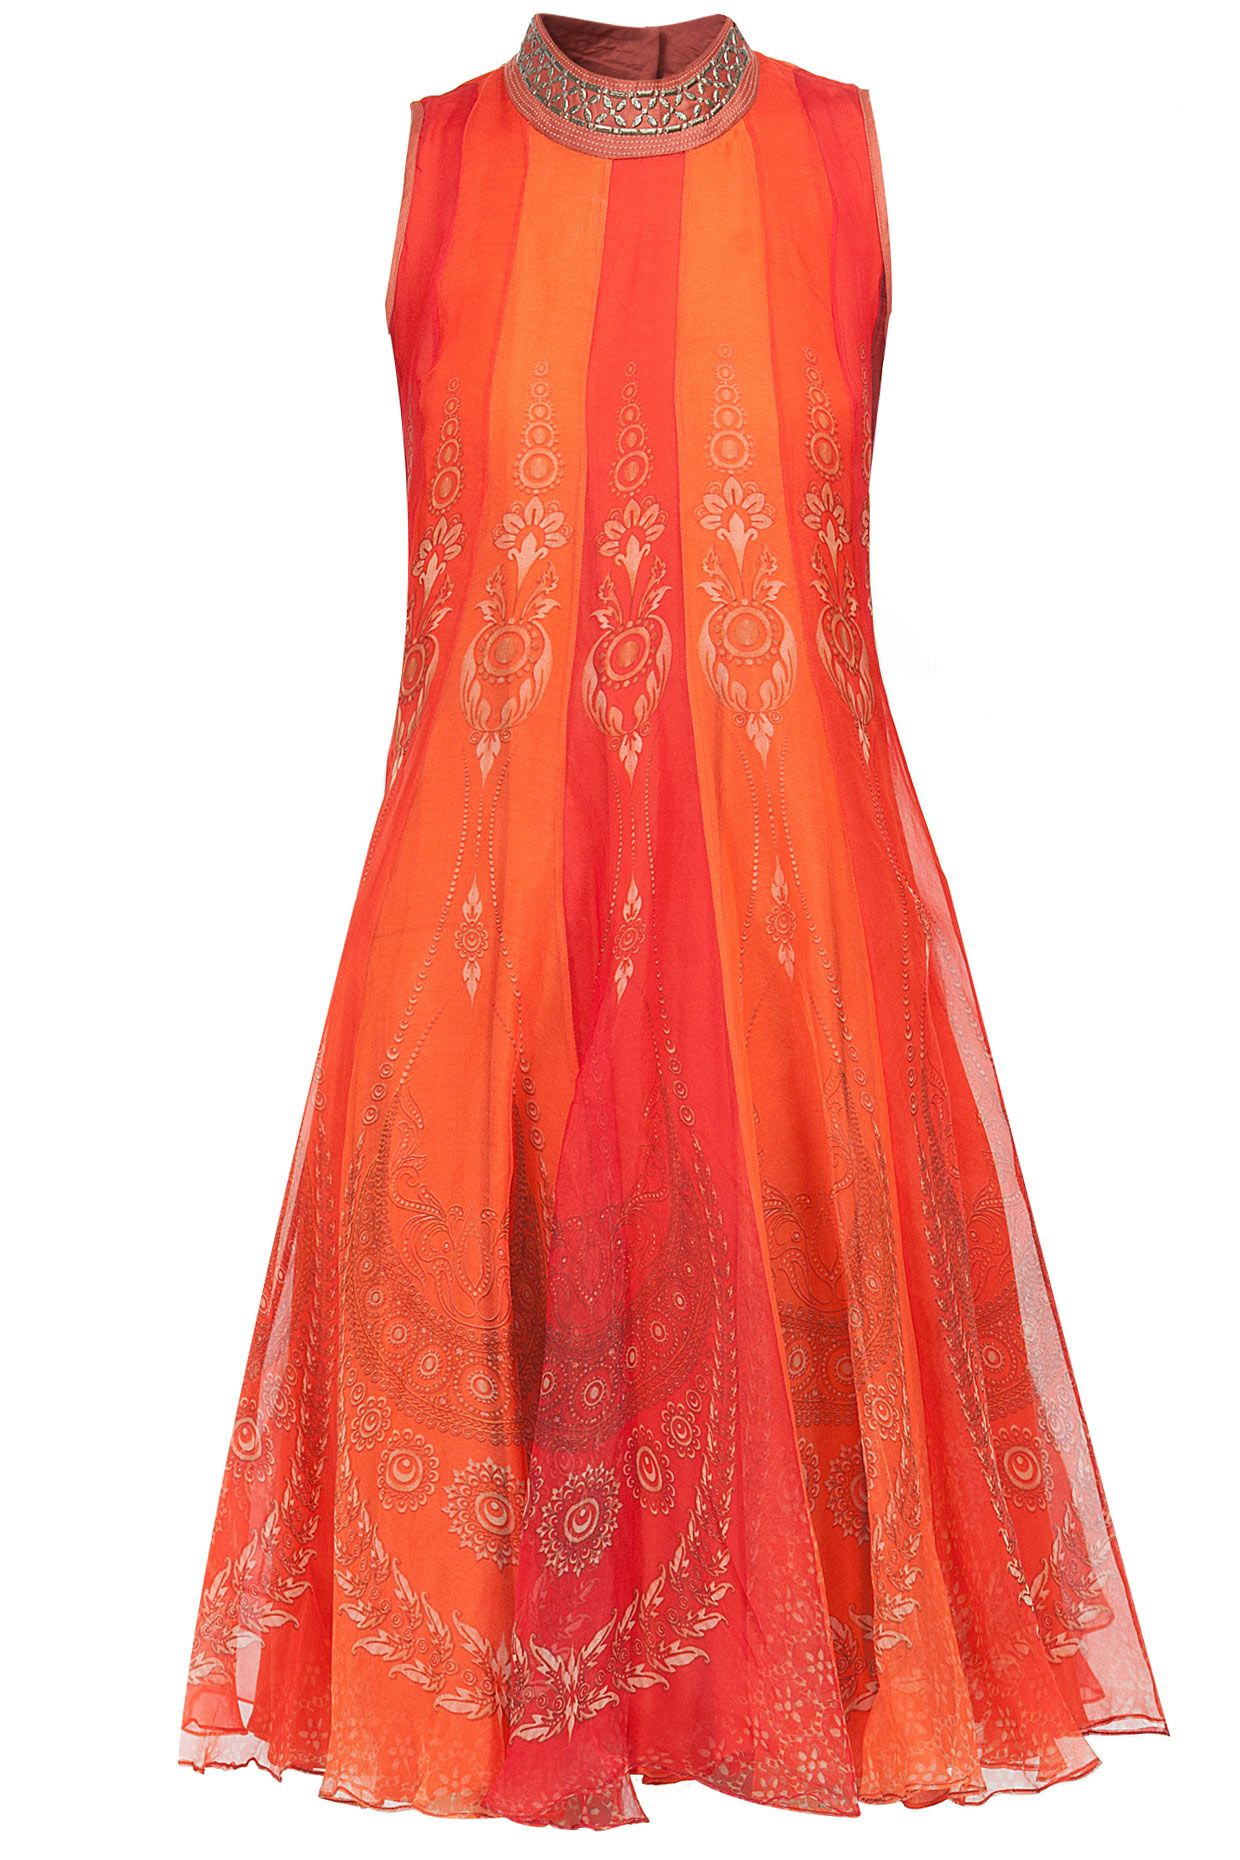 Red bidri plate flare sheer dress by tarun tahiliani shop now at